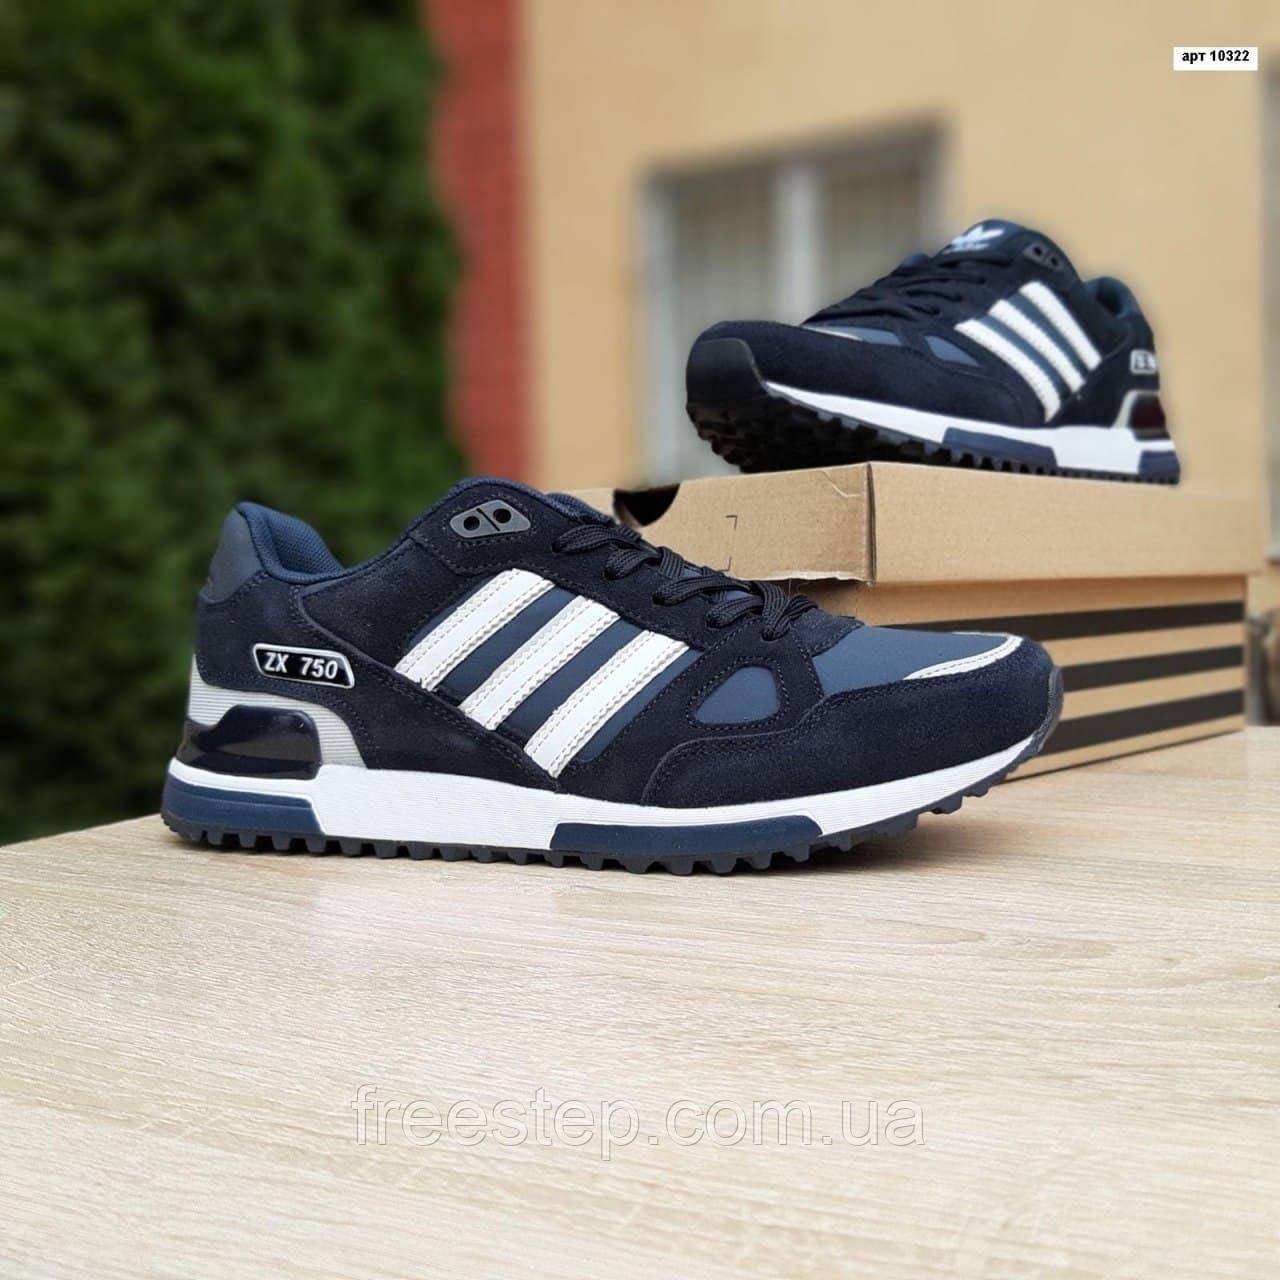 Мужские кроссовки в стиле  Adidas ZX 750 синие